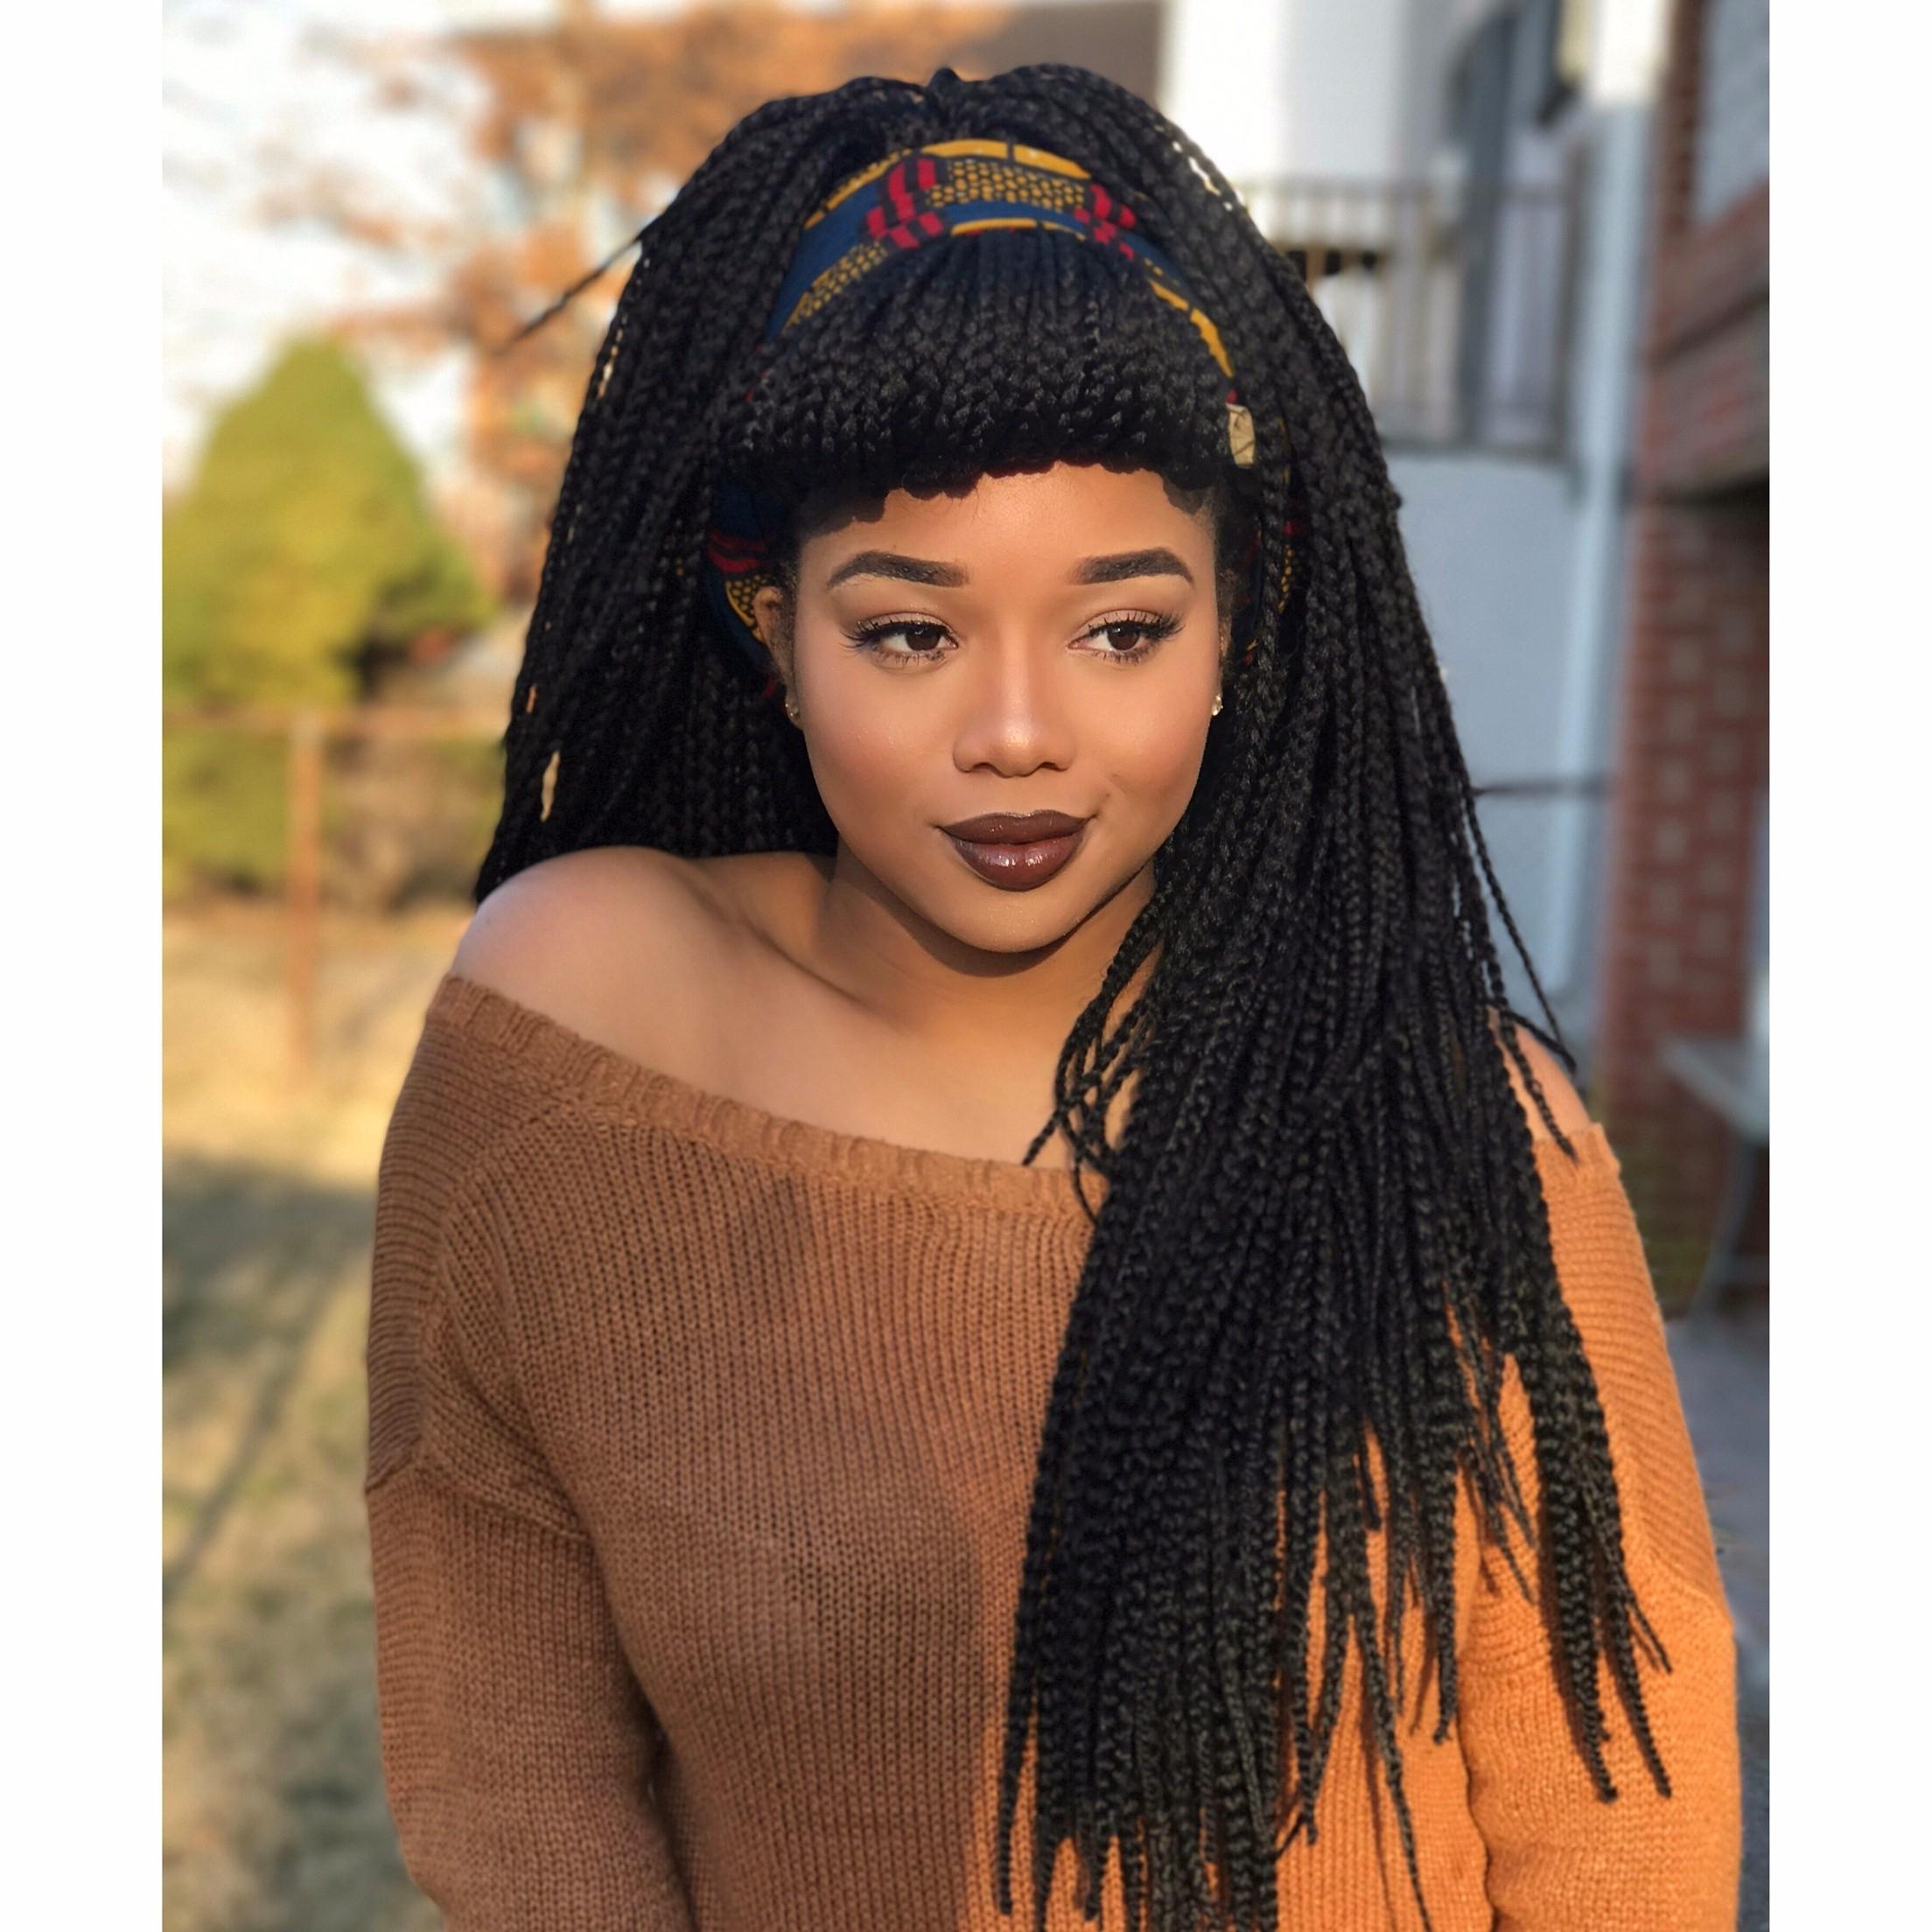 Favorite Braided Hairstyles For Black Women Regarding The Top 10 Summer Braid Hairstyles For Black Women – Mane Guru (View 4 of 15)